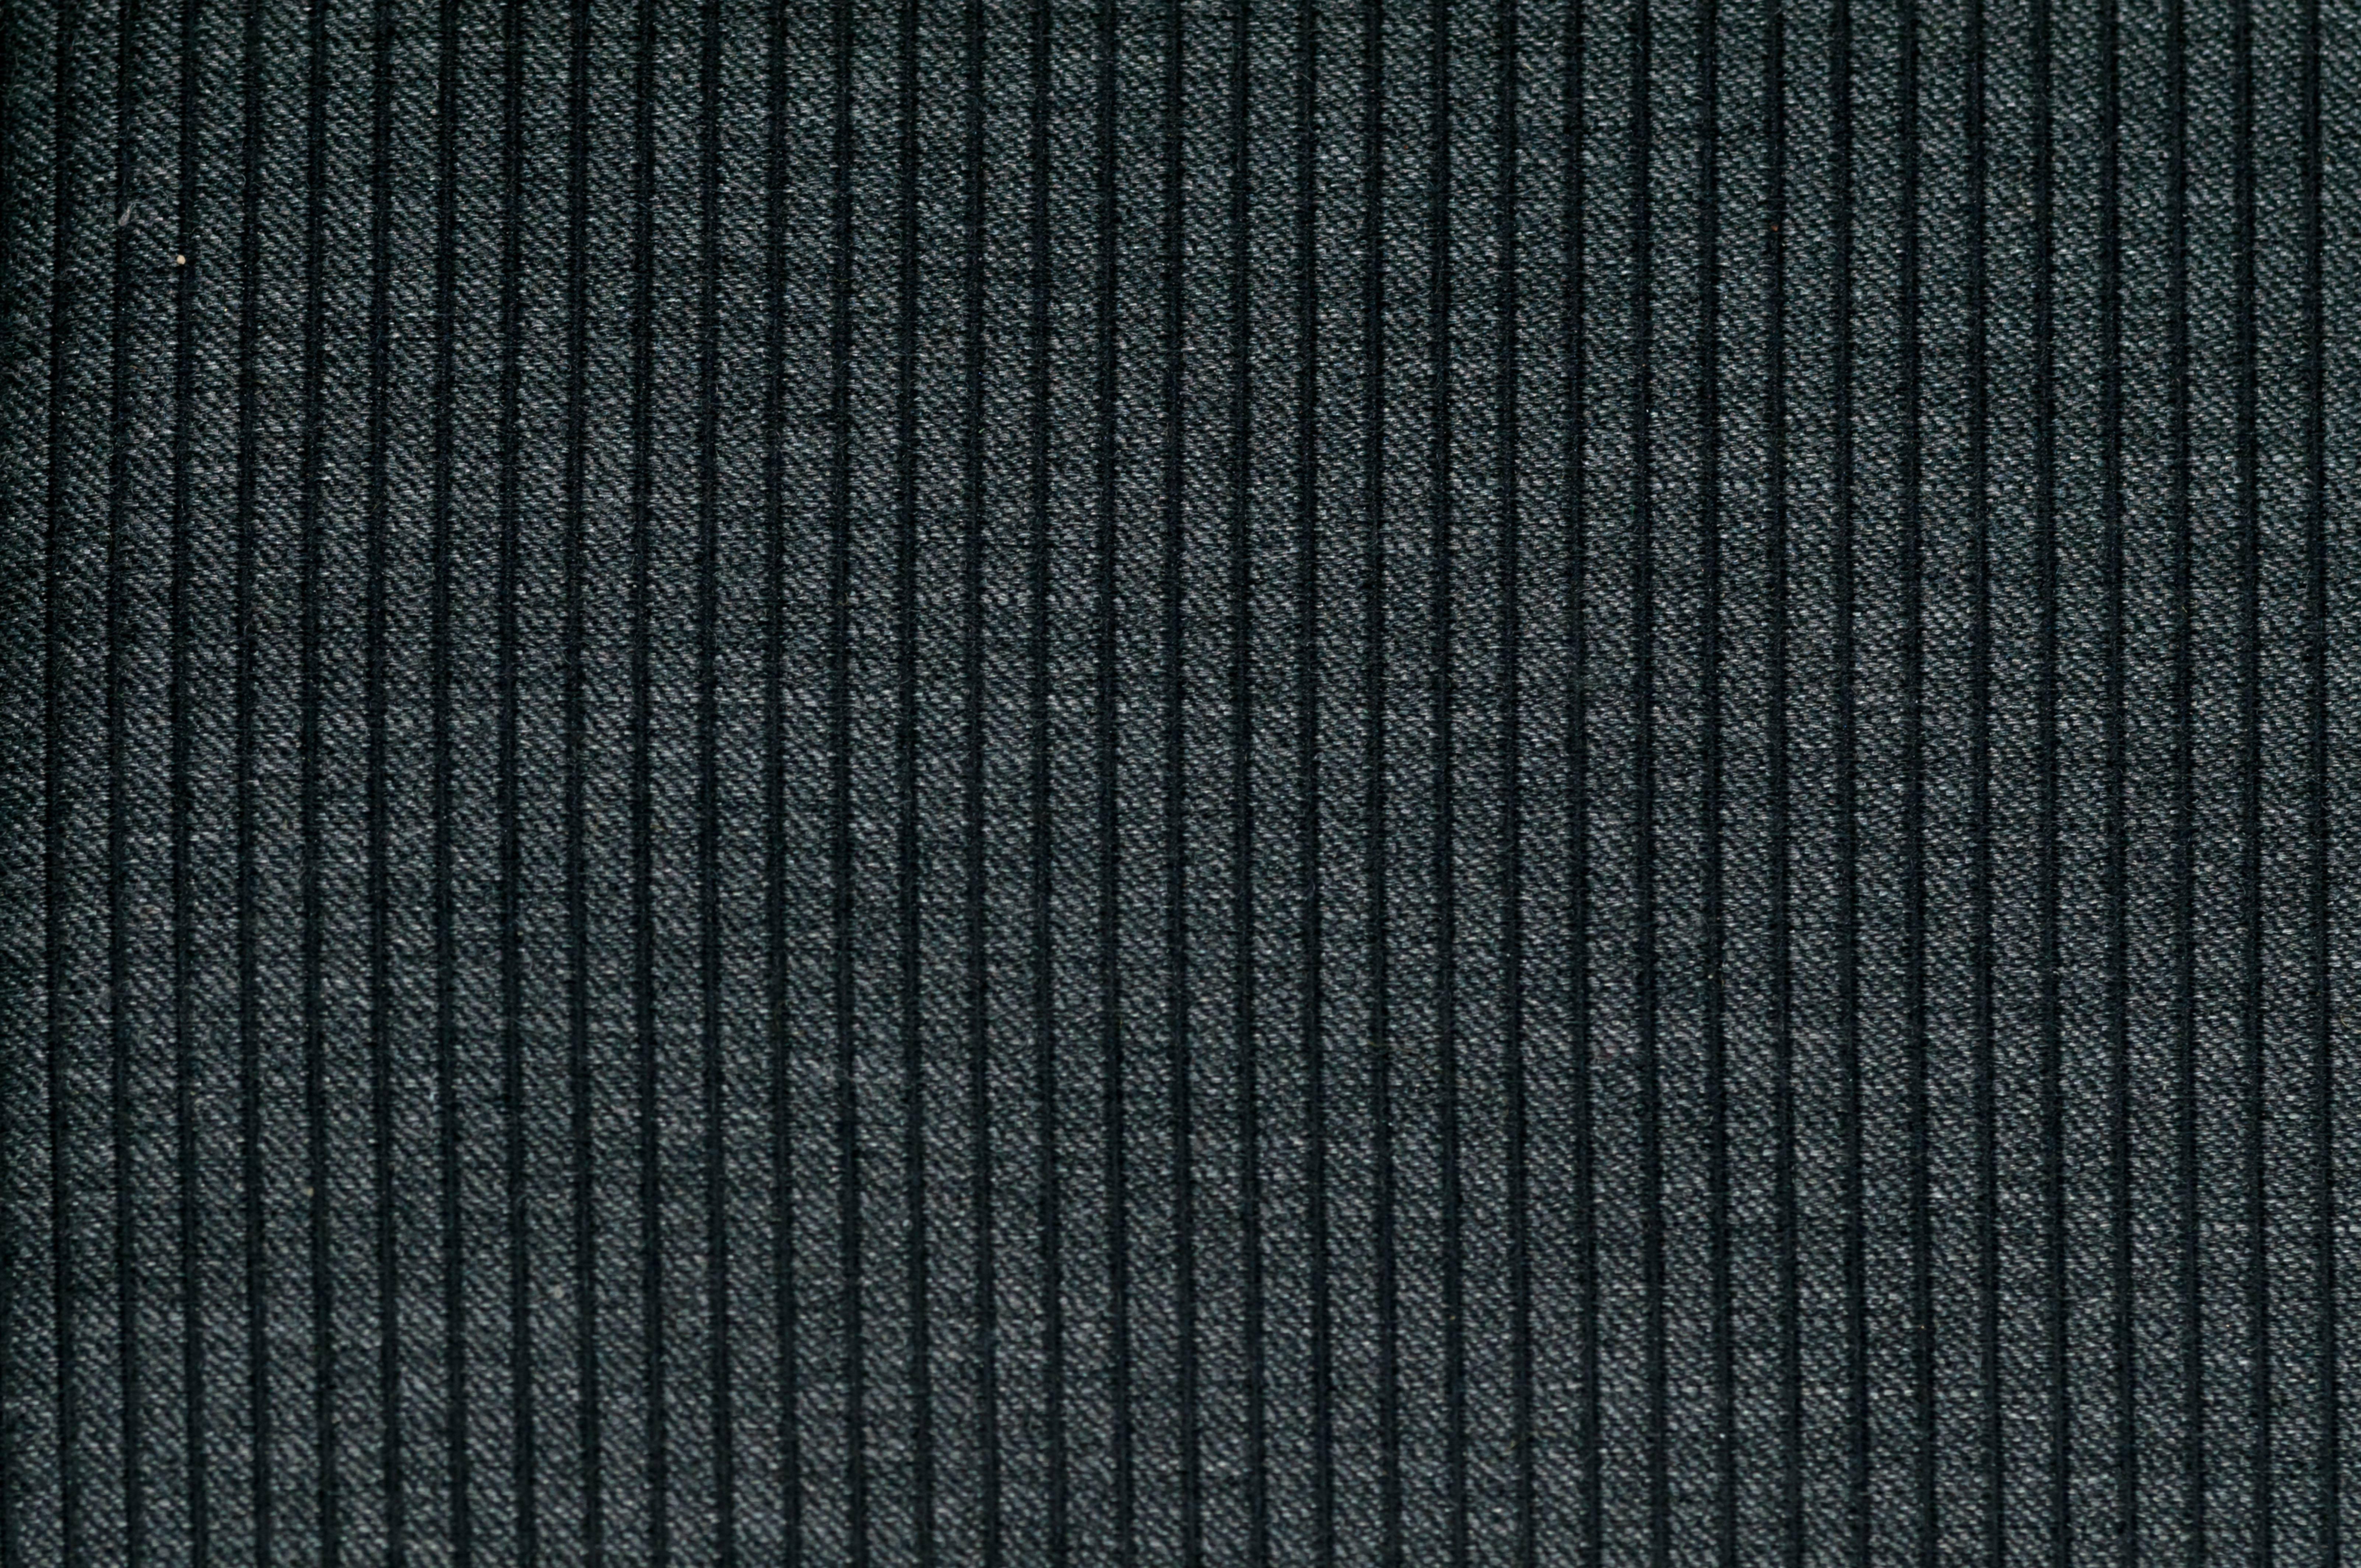 Dark grey couch fabric texture